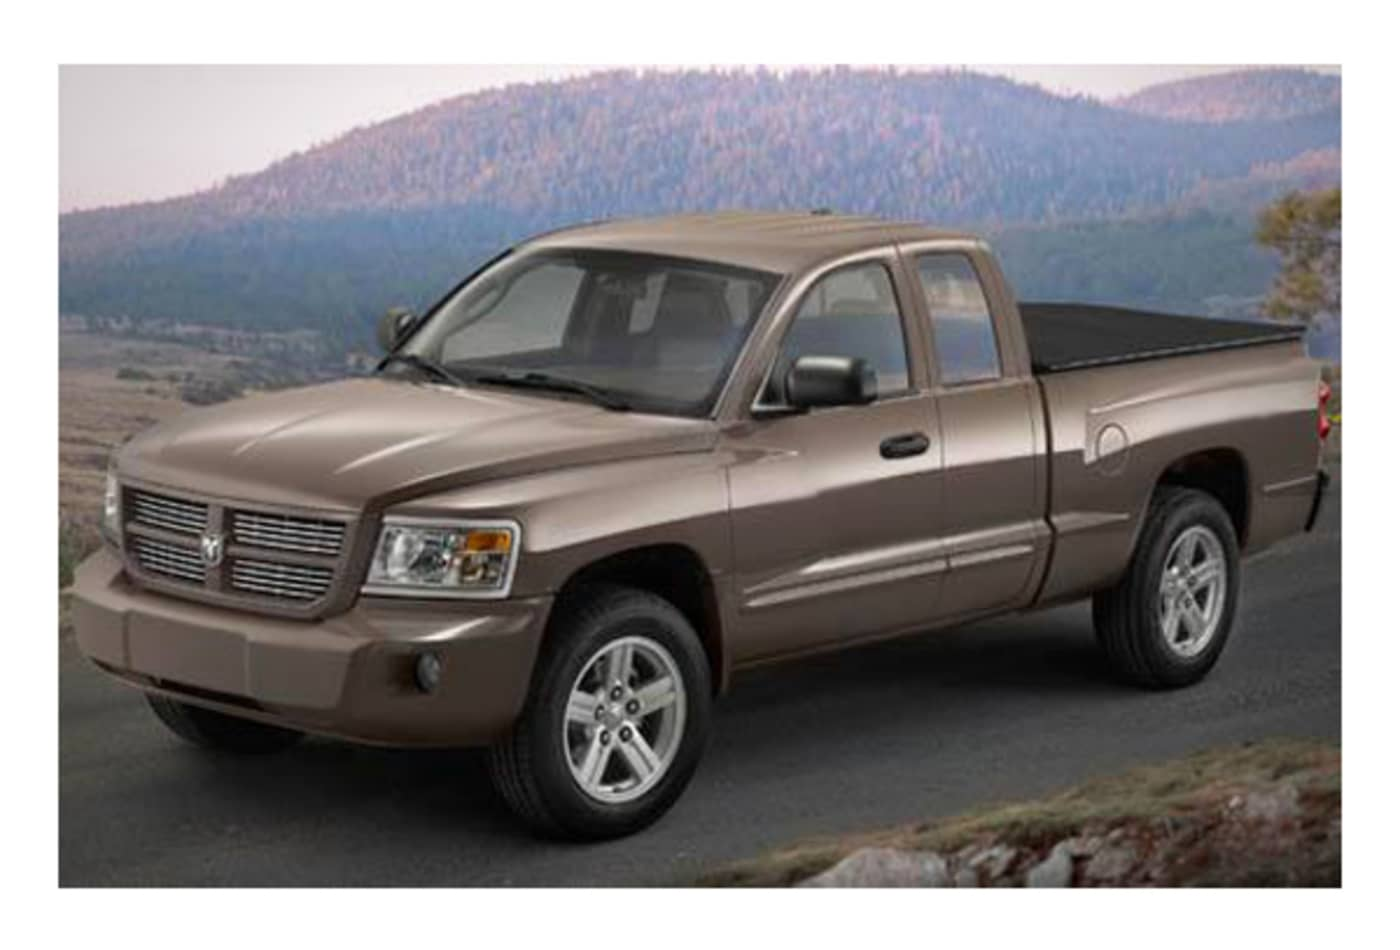 Dodge-Dakota-Cars-More-Expensive-Used-SS.jpg